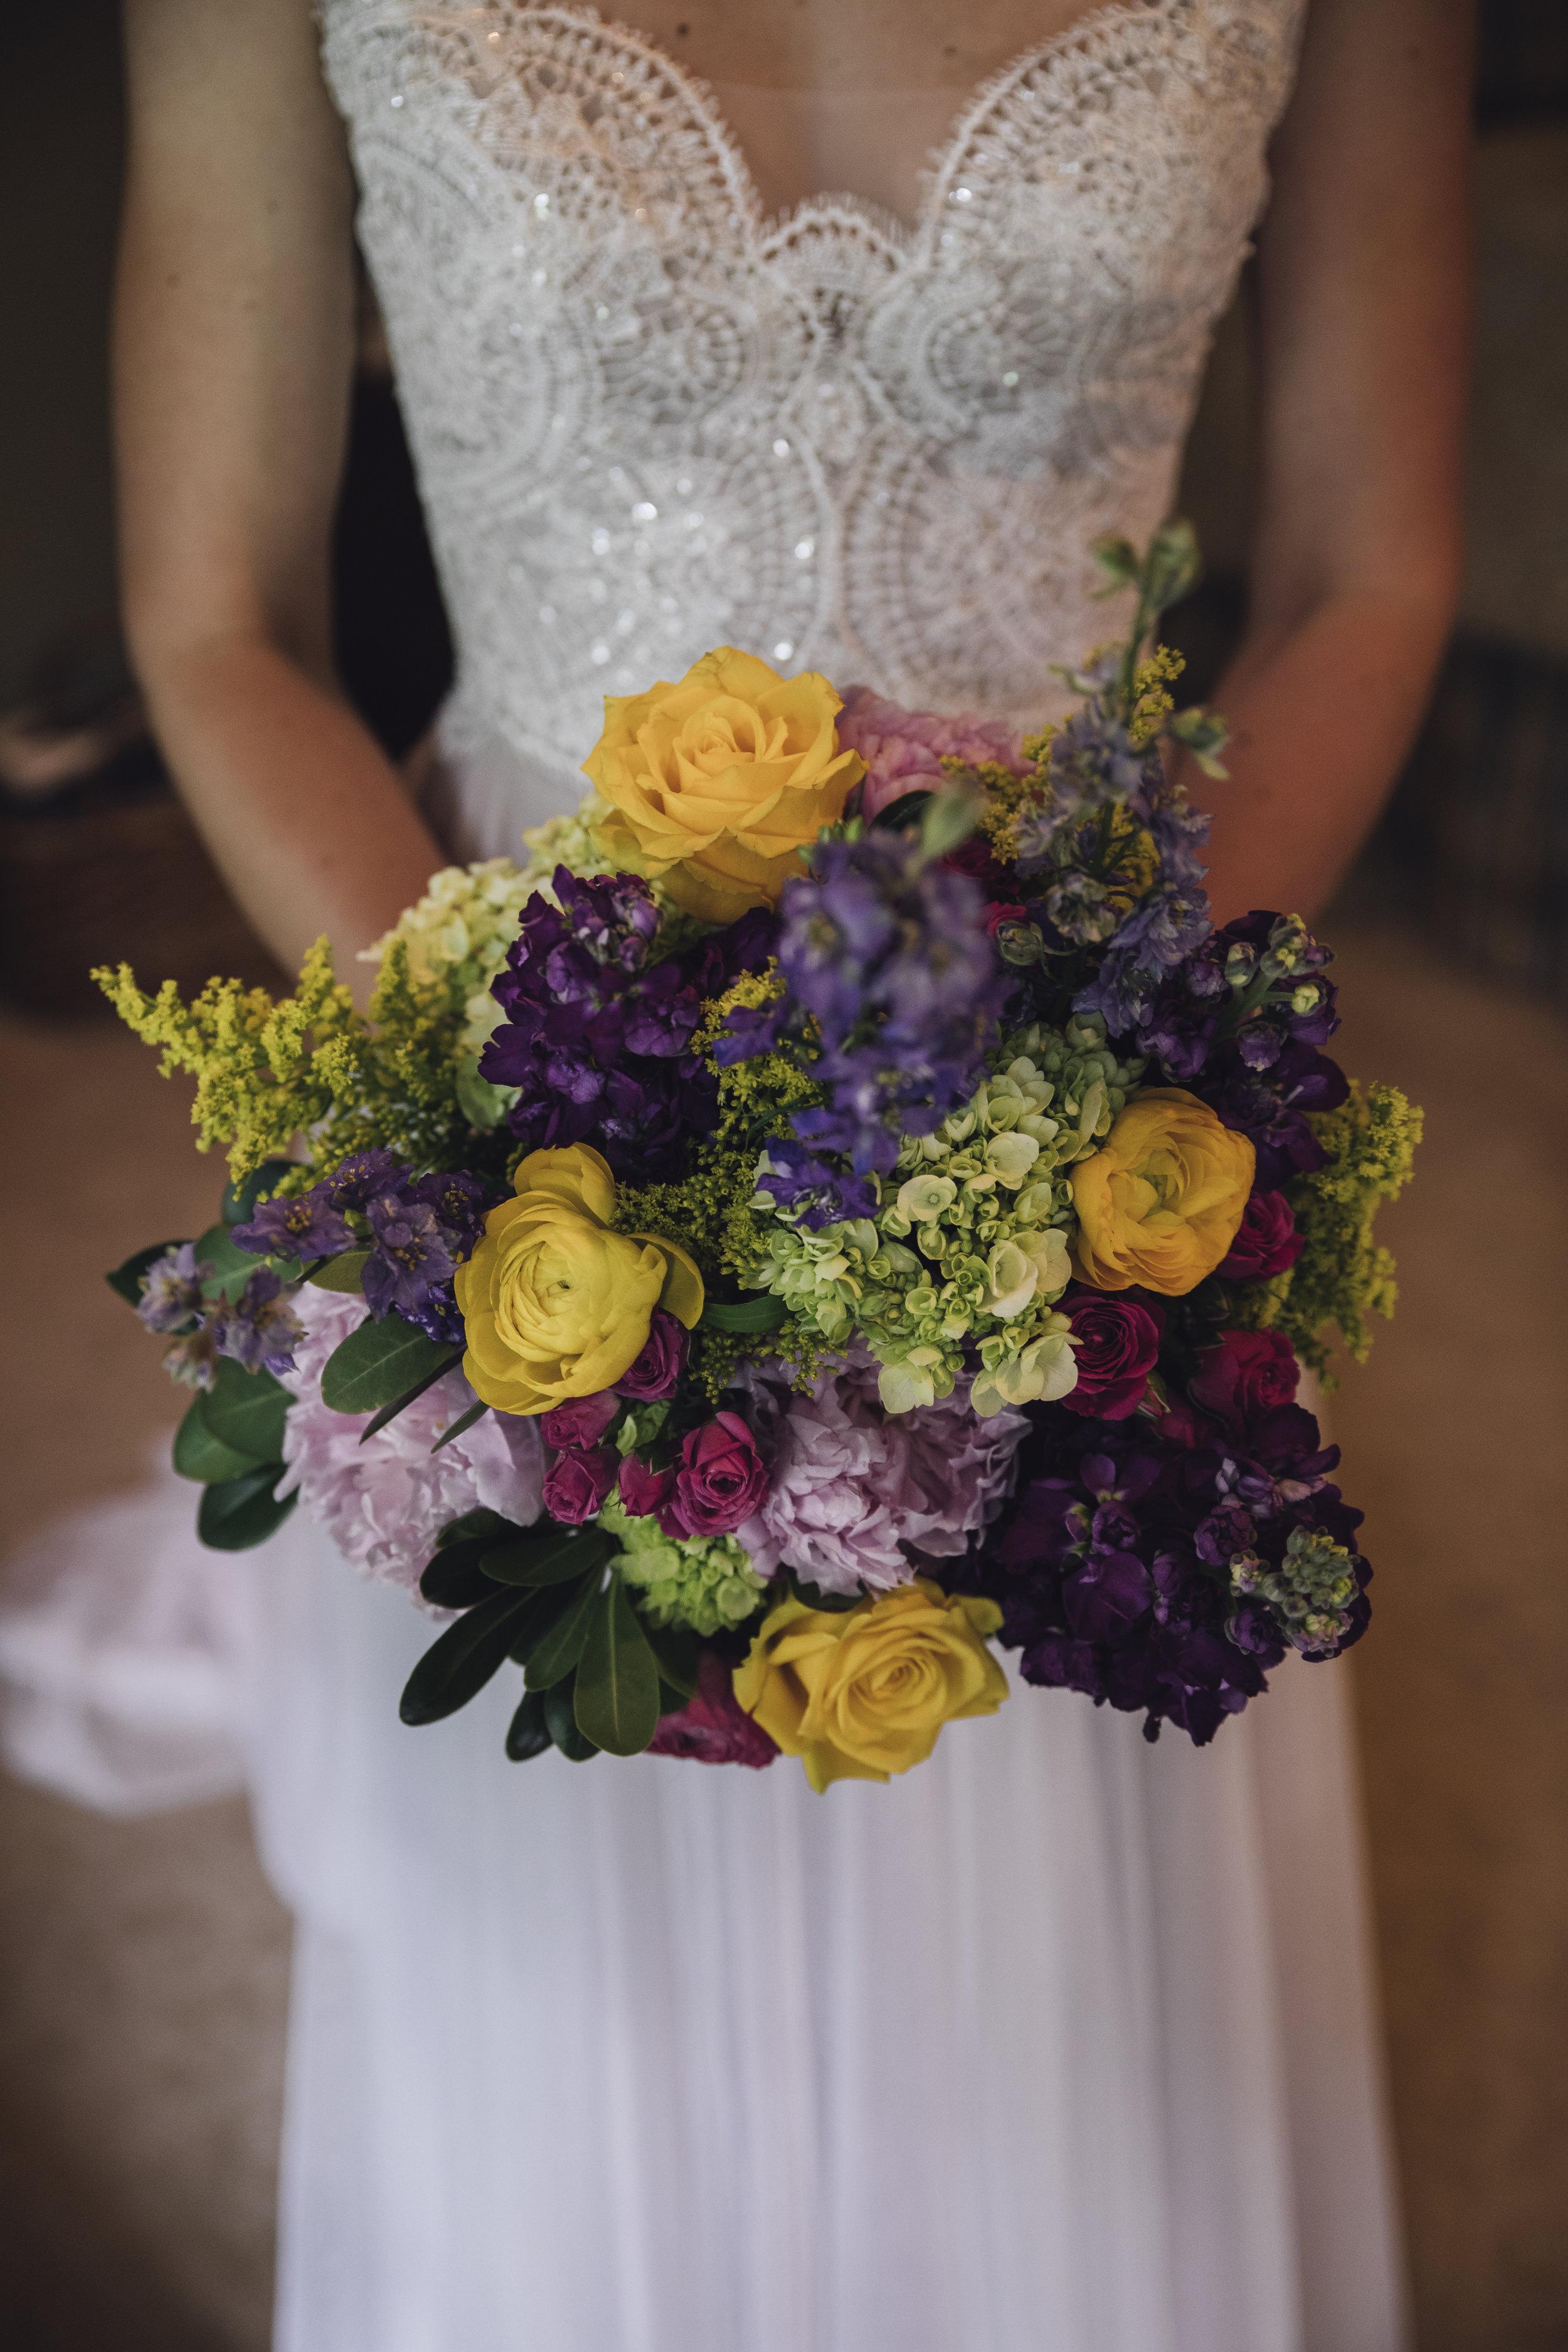 20170520_4217before wedding.jpg